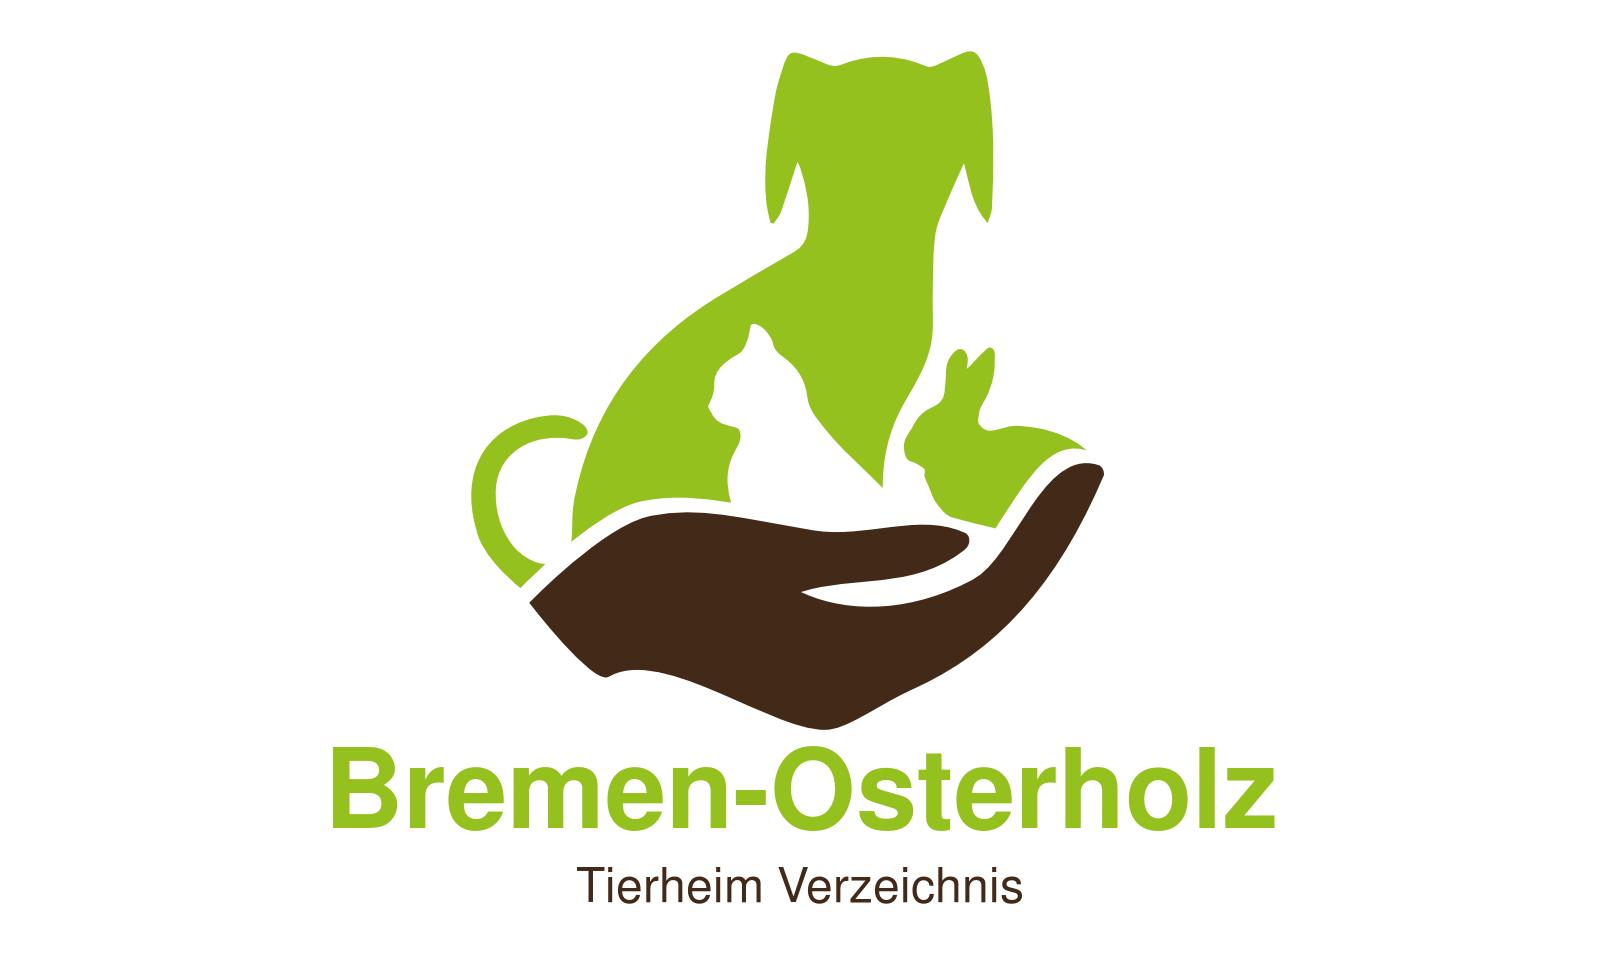 Tierheim Bremen Osterholz